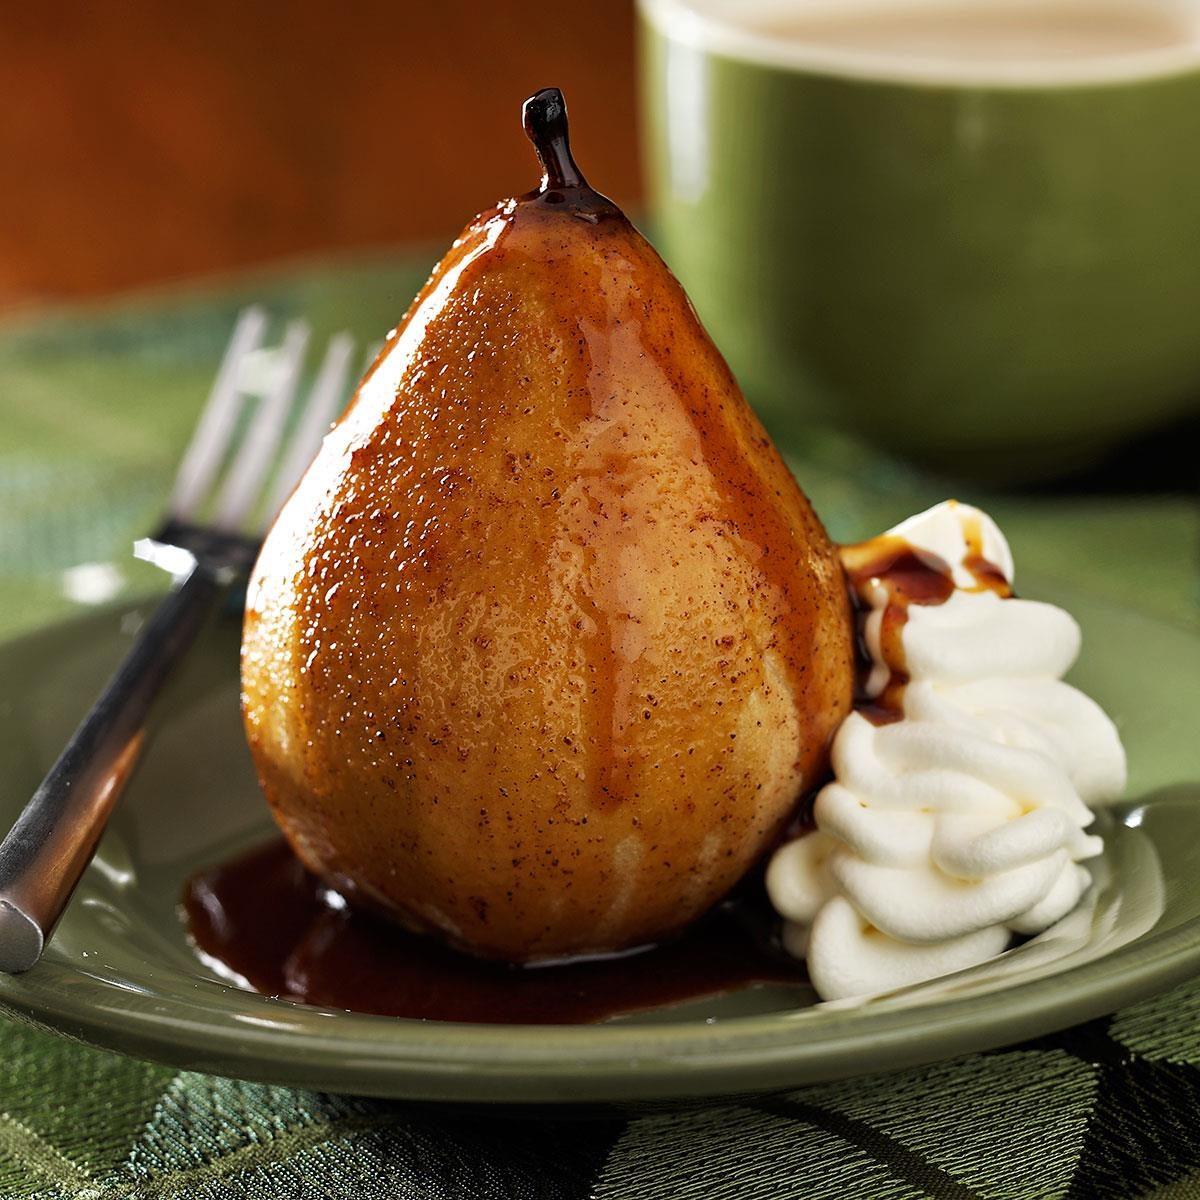 Honey Roasted Pears Recipe | Taste of Home